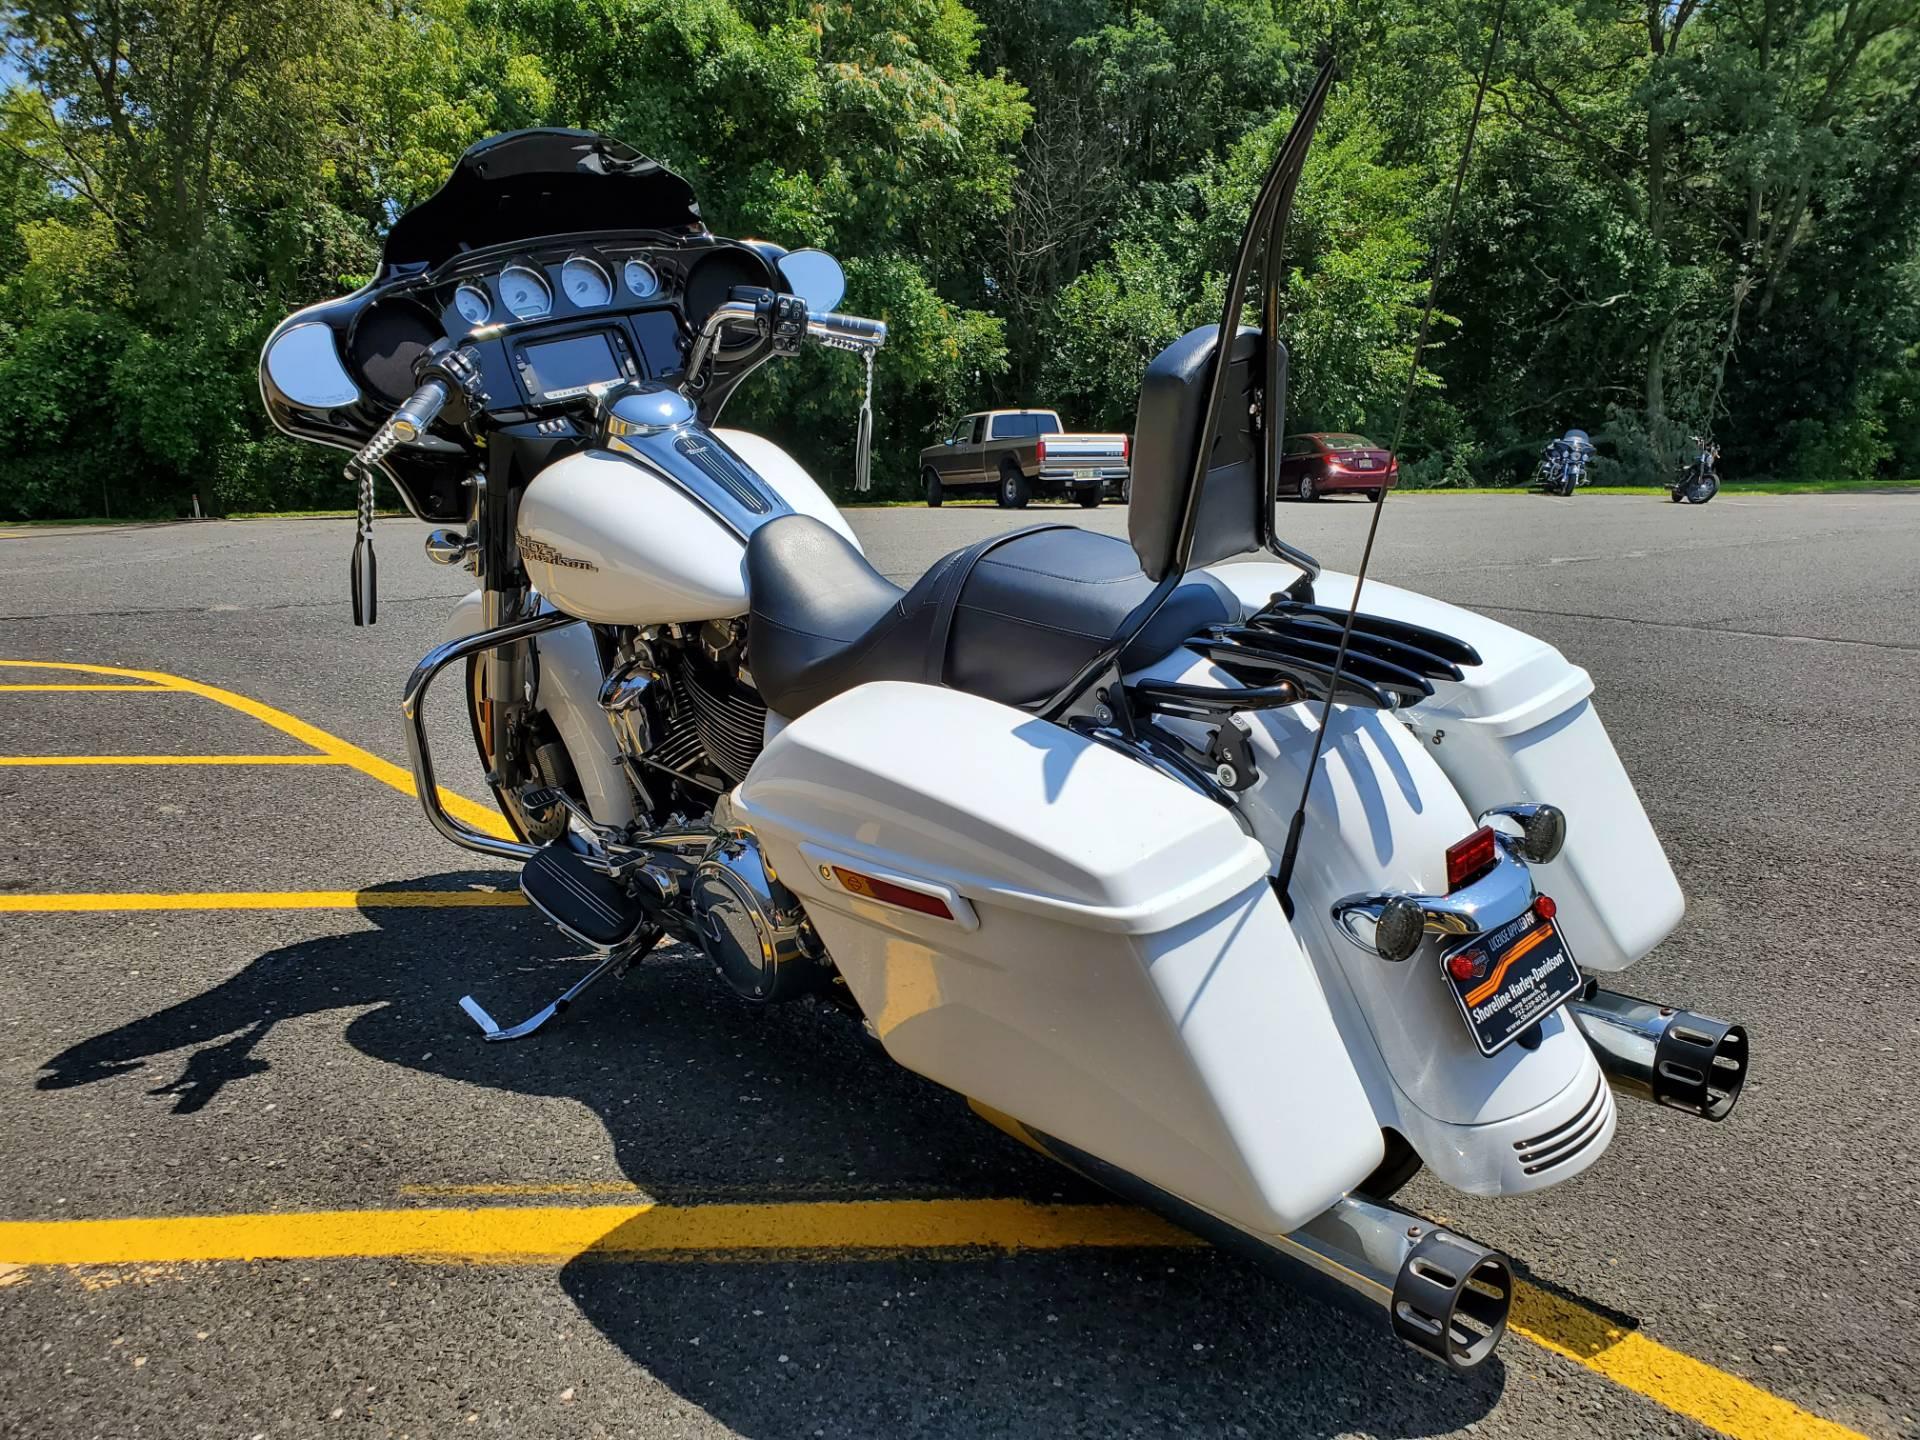 Harley Davidson Fuel Petcock Positions